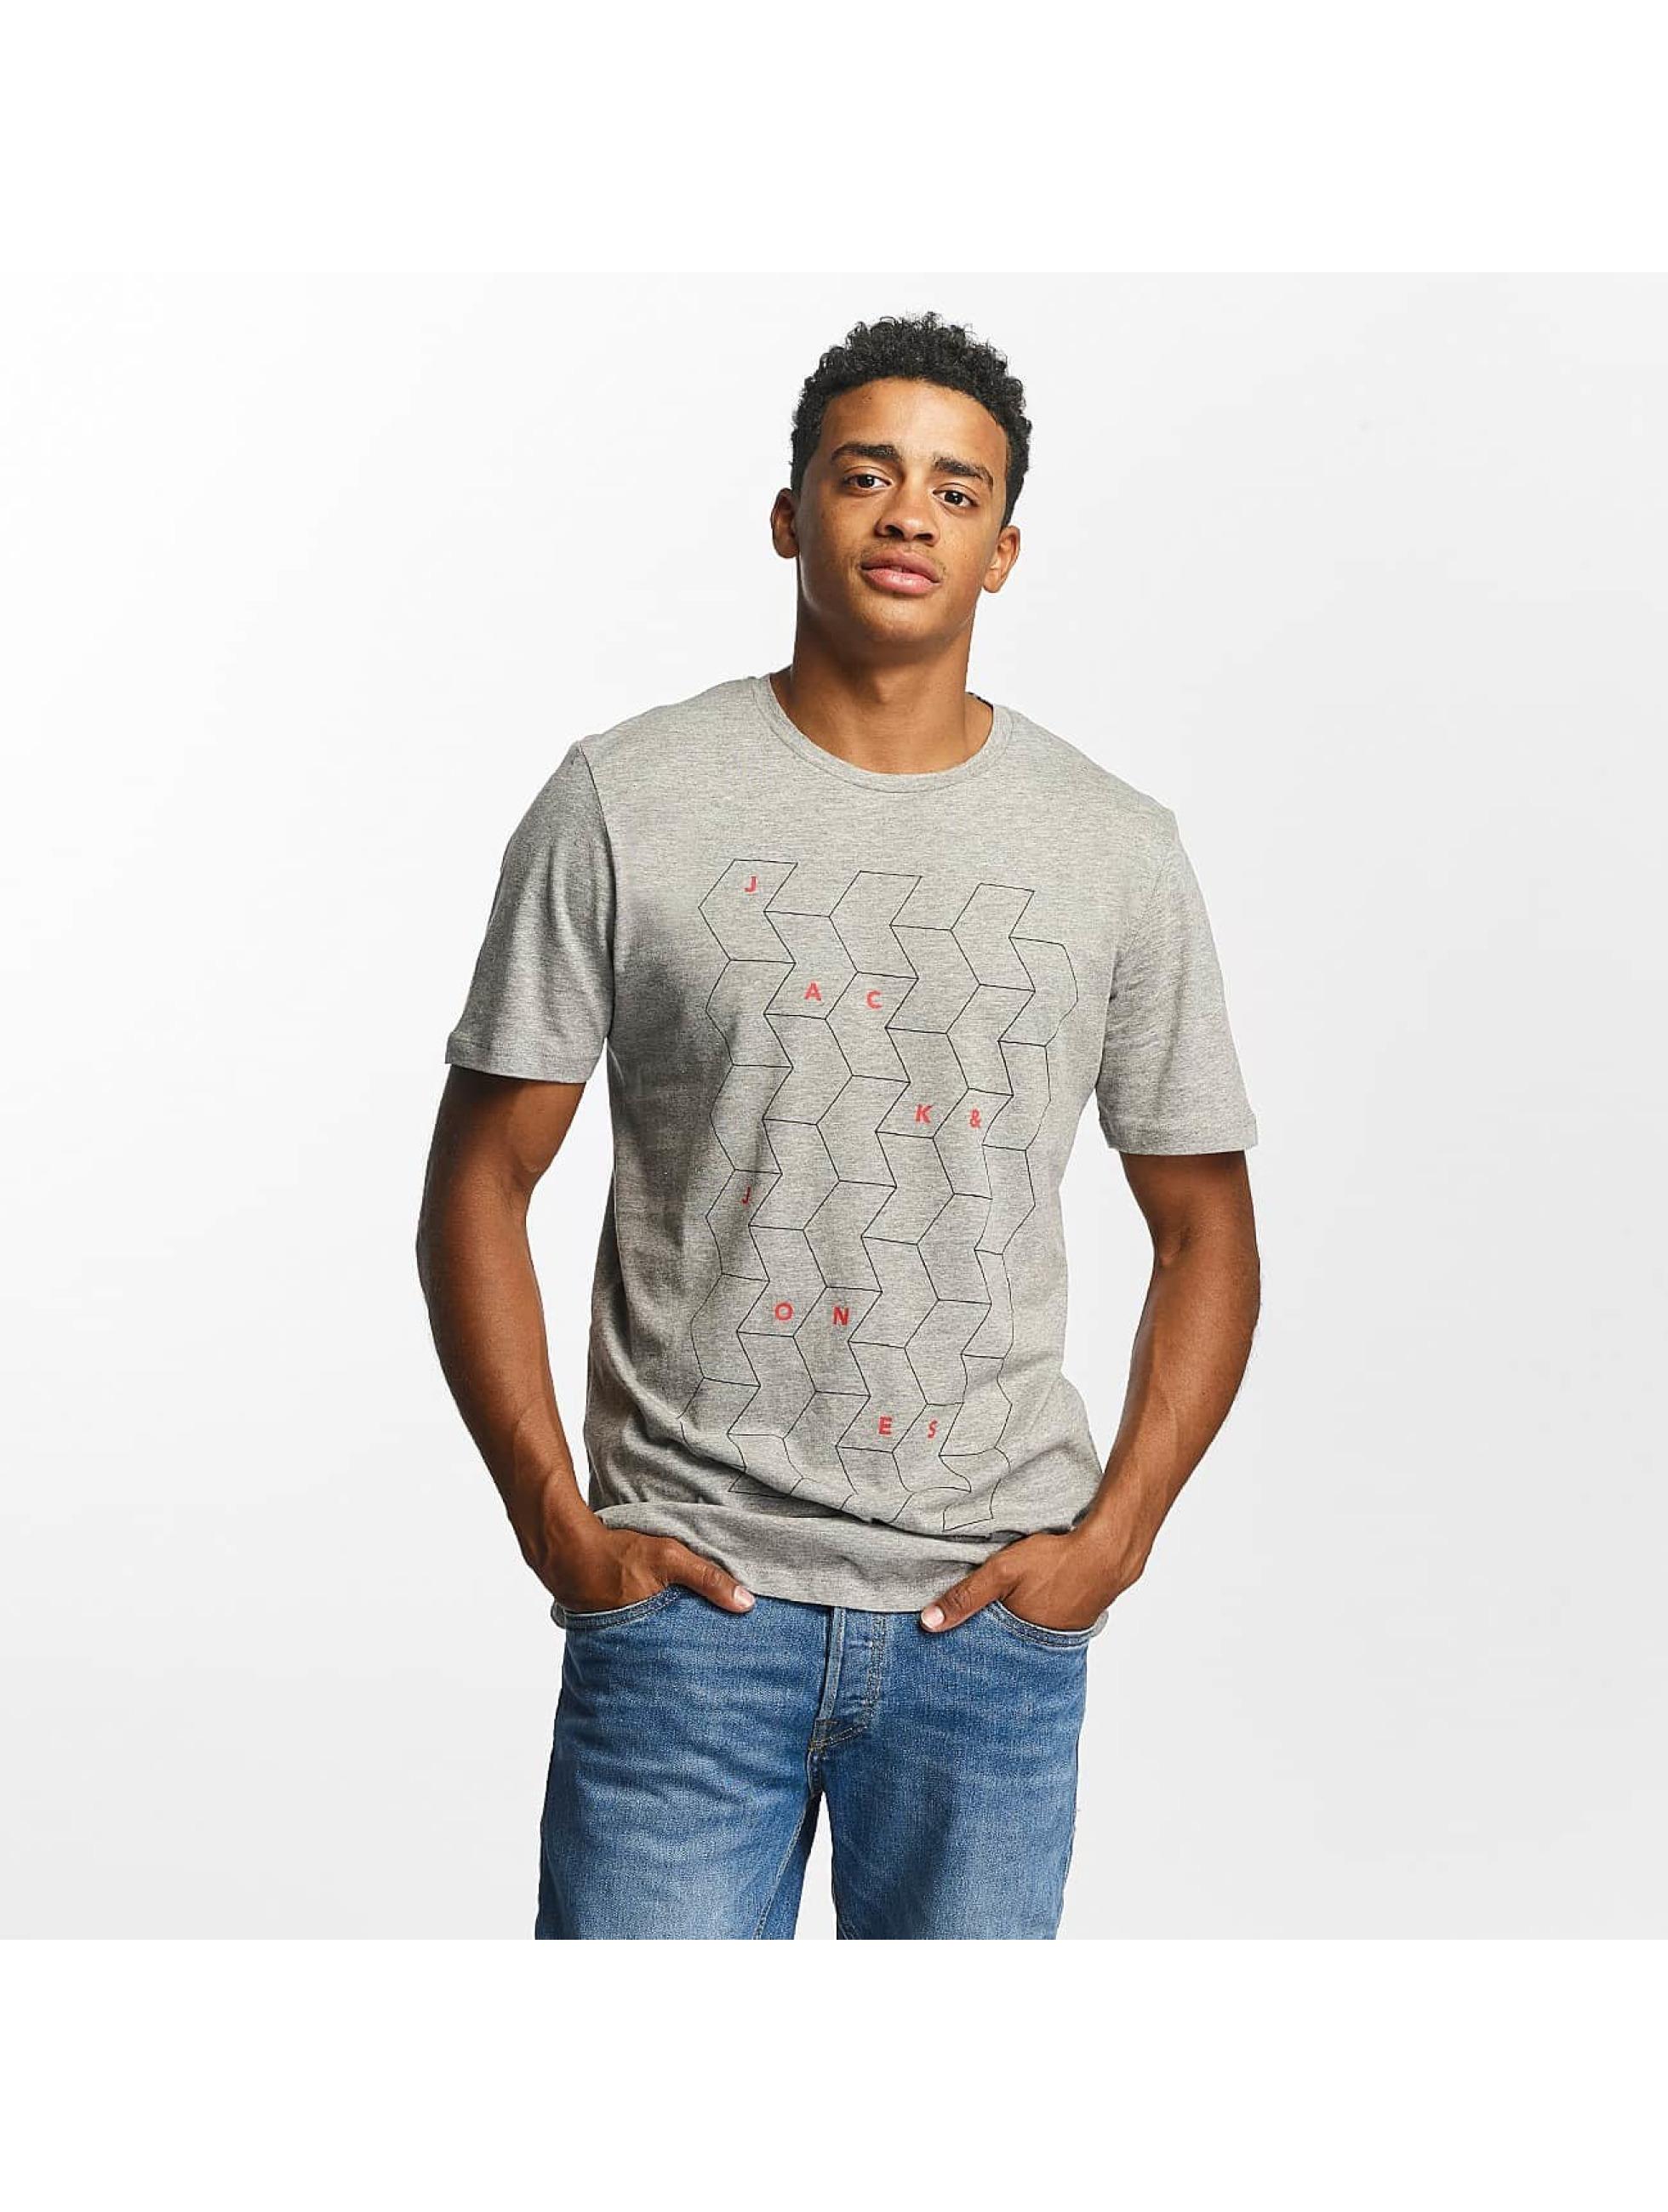 Jack-amp-Jones-Uomini-Maglieria-T-shirt-jjcoConcept